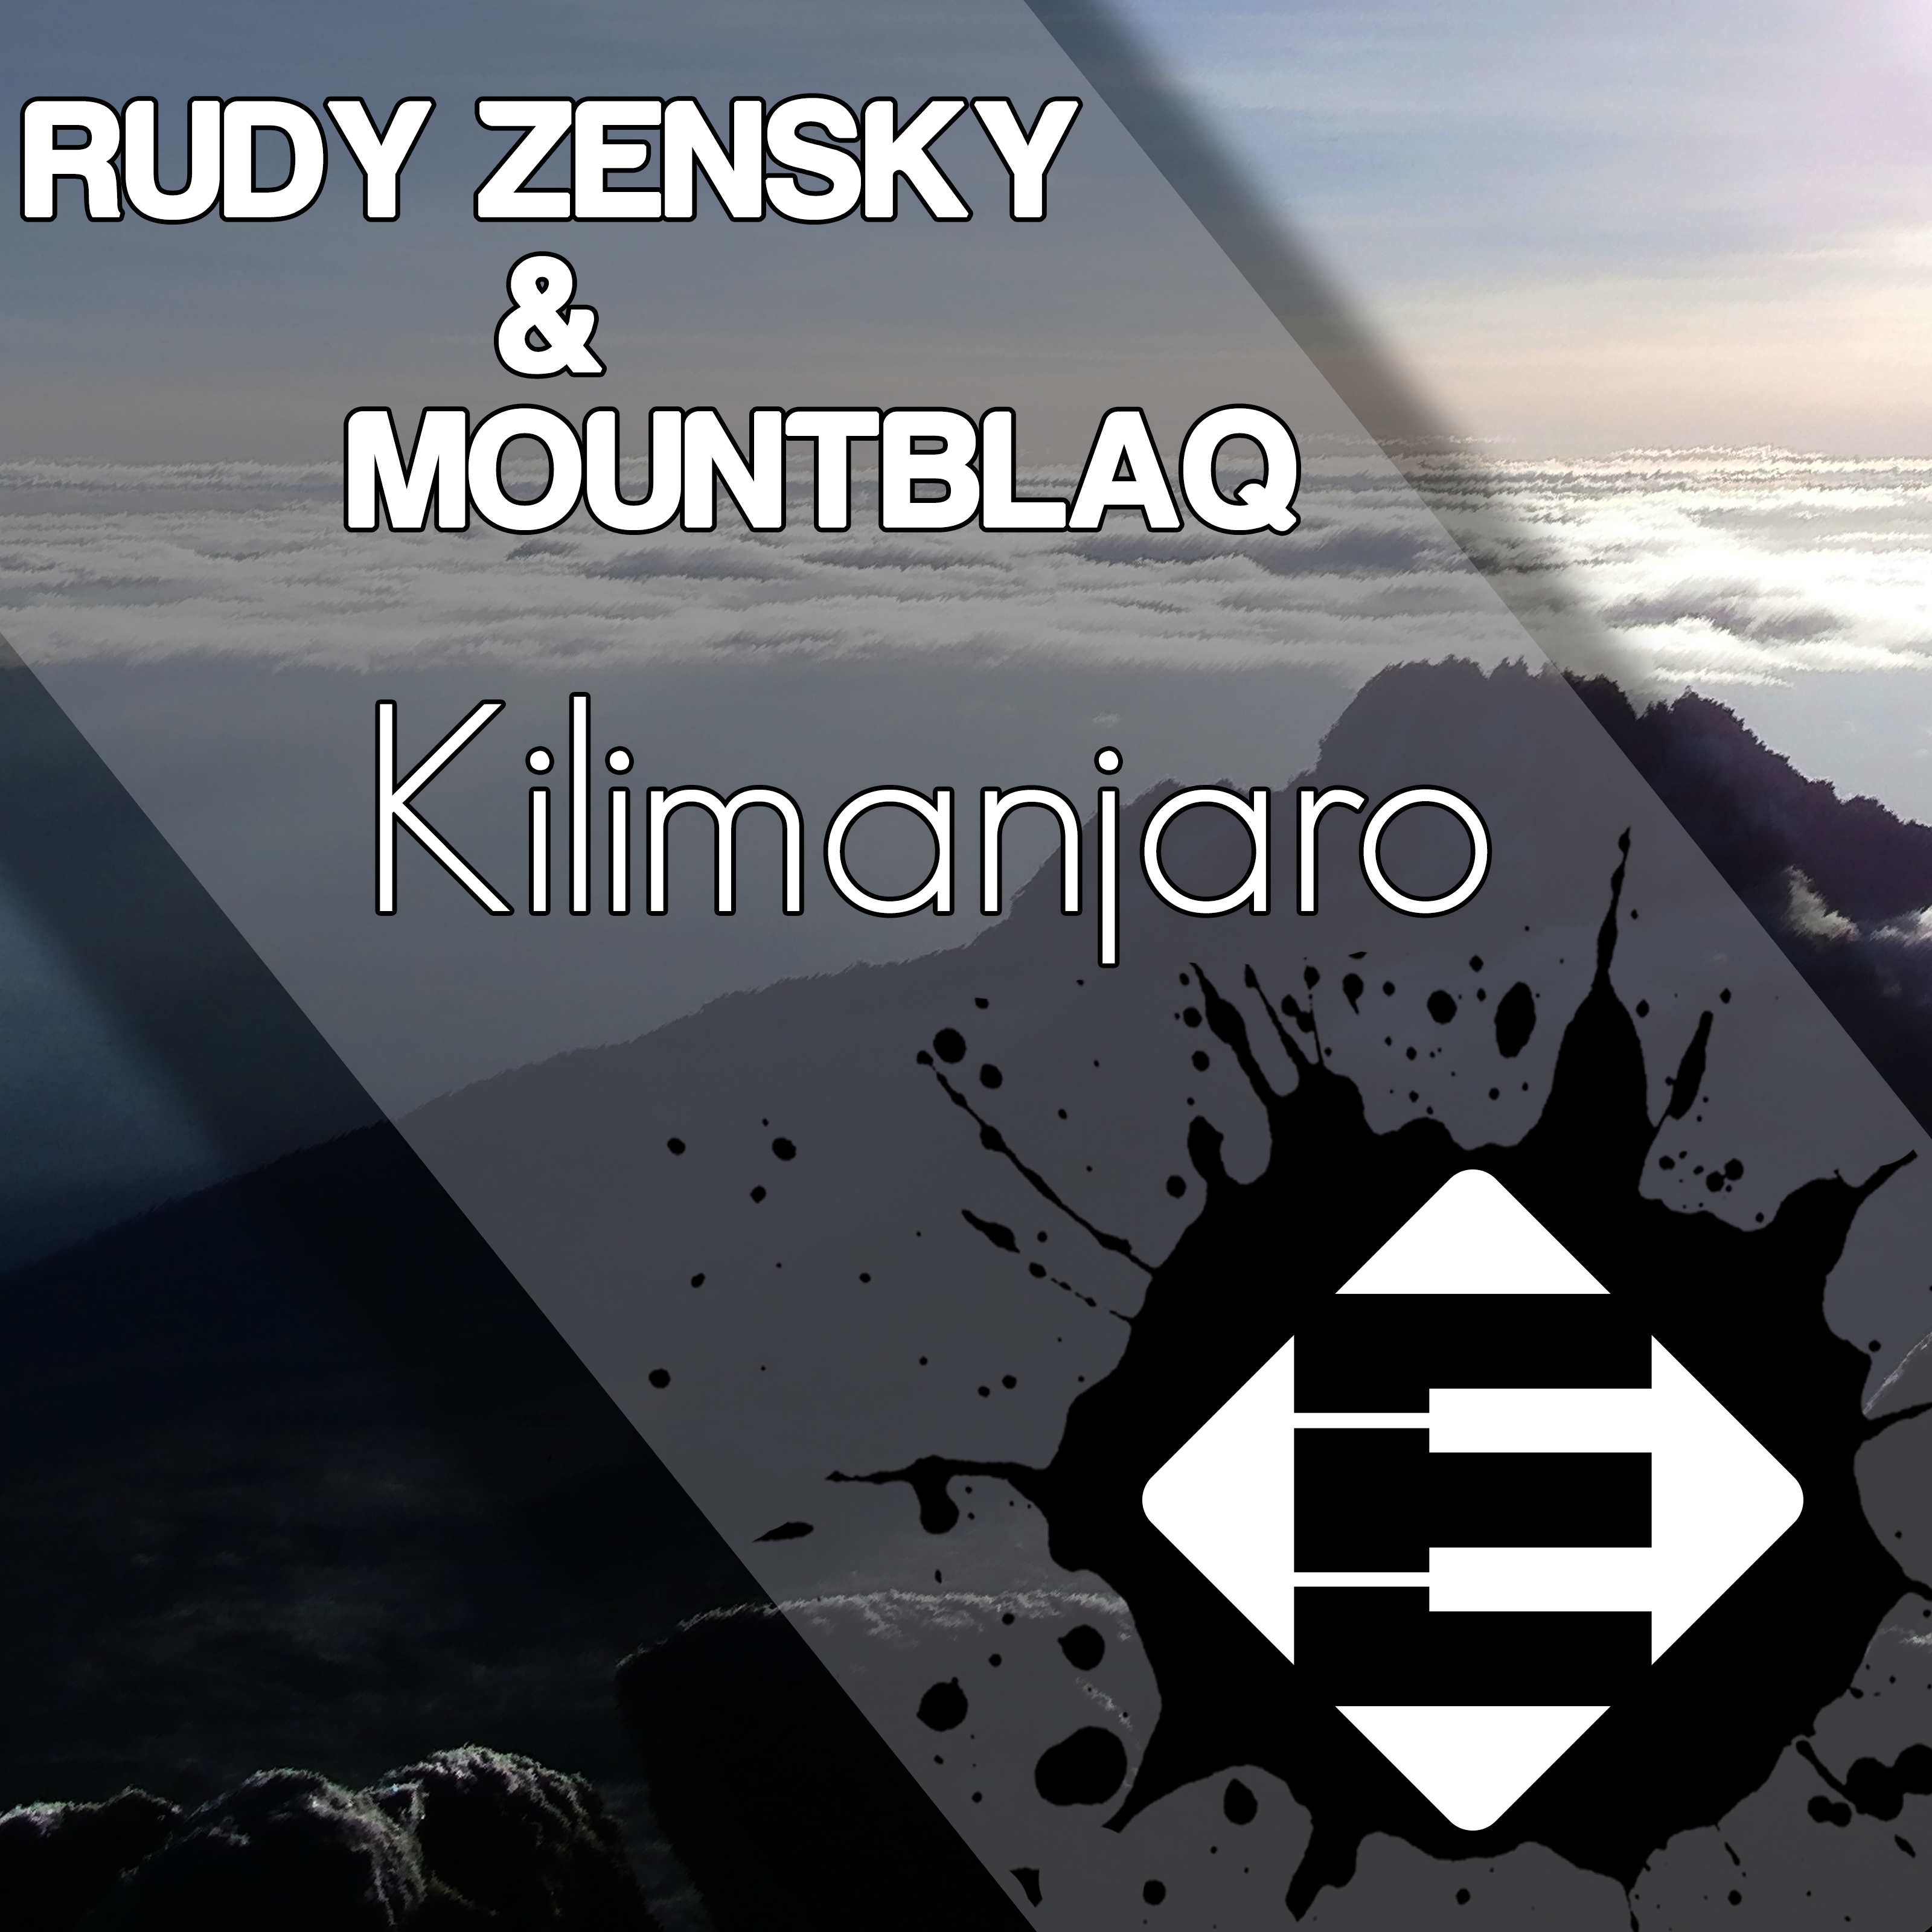 rudy_zensky_mountblaq_-_kilimanjaro.jpg